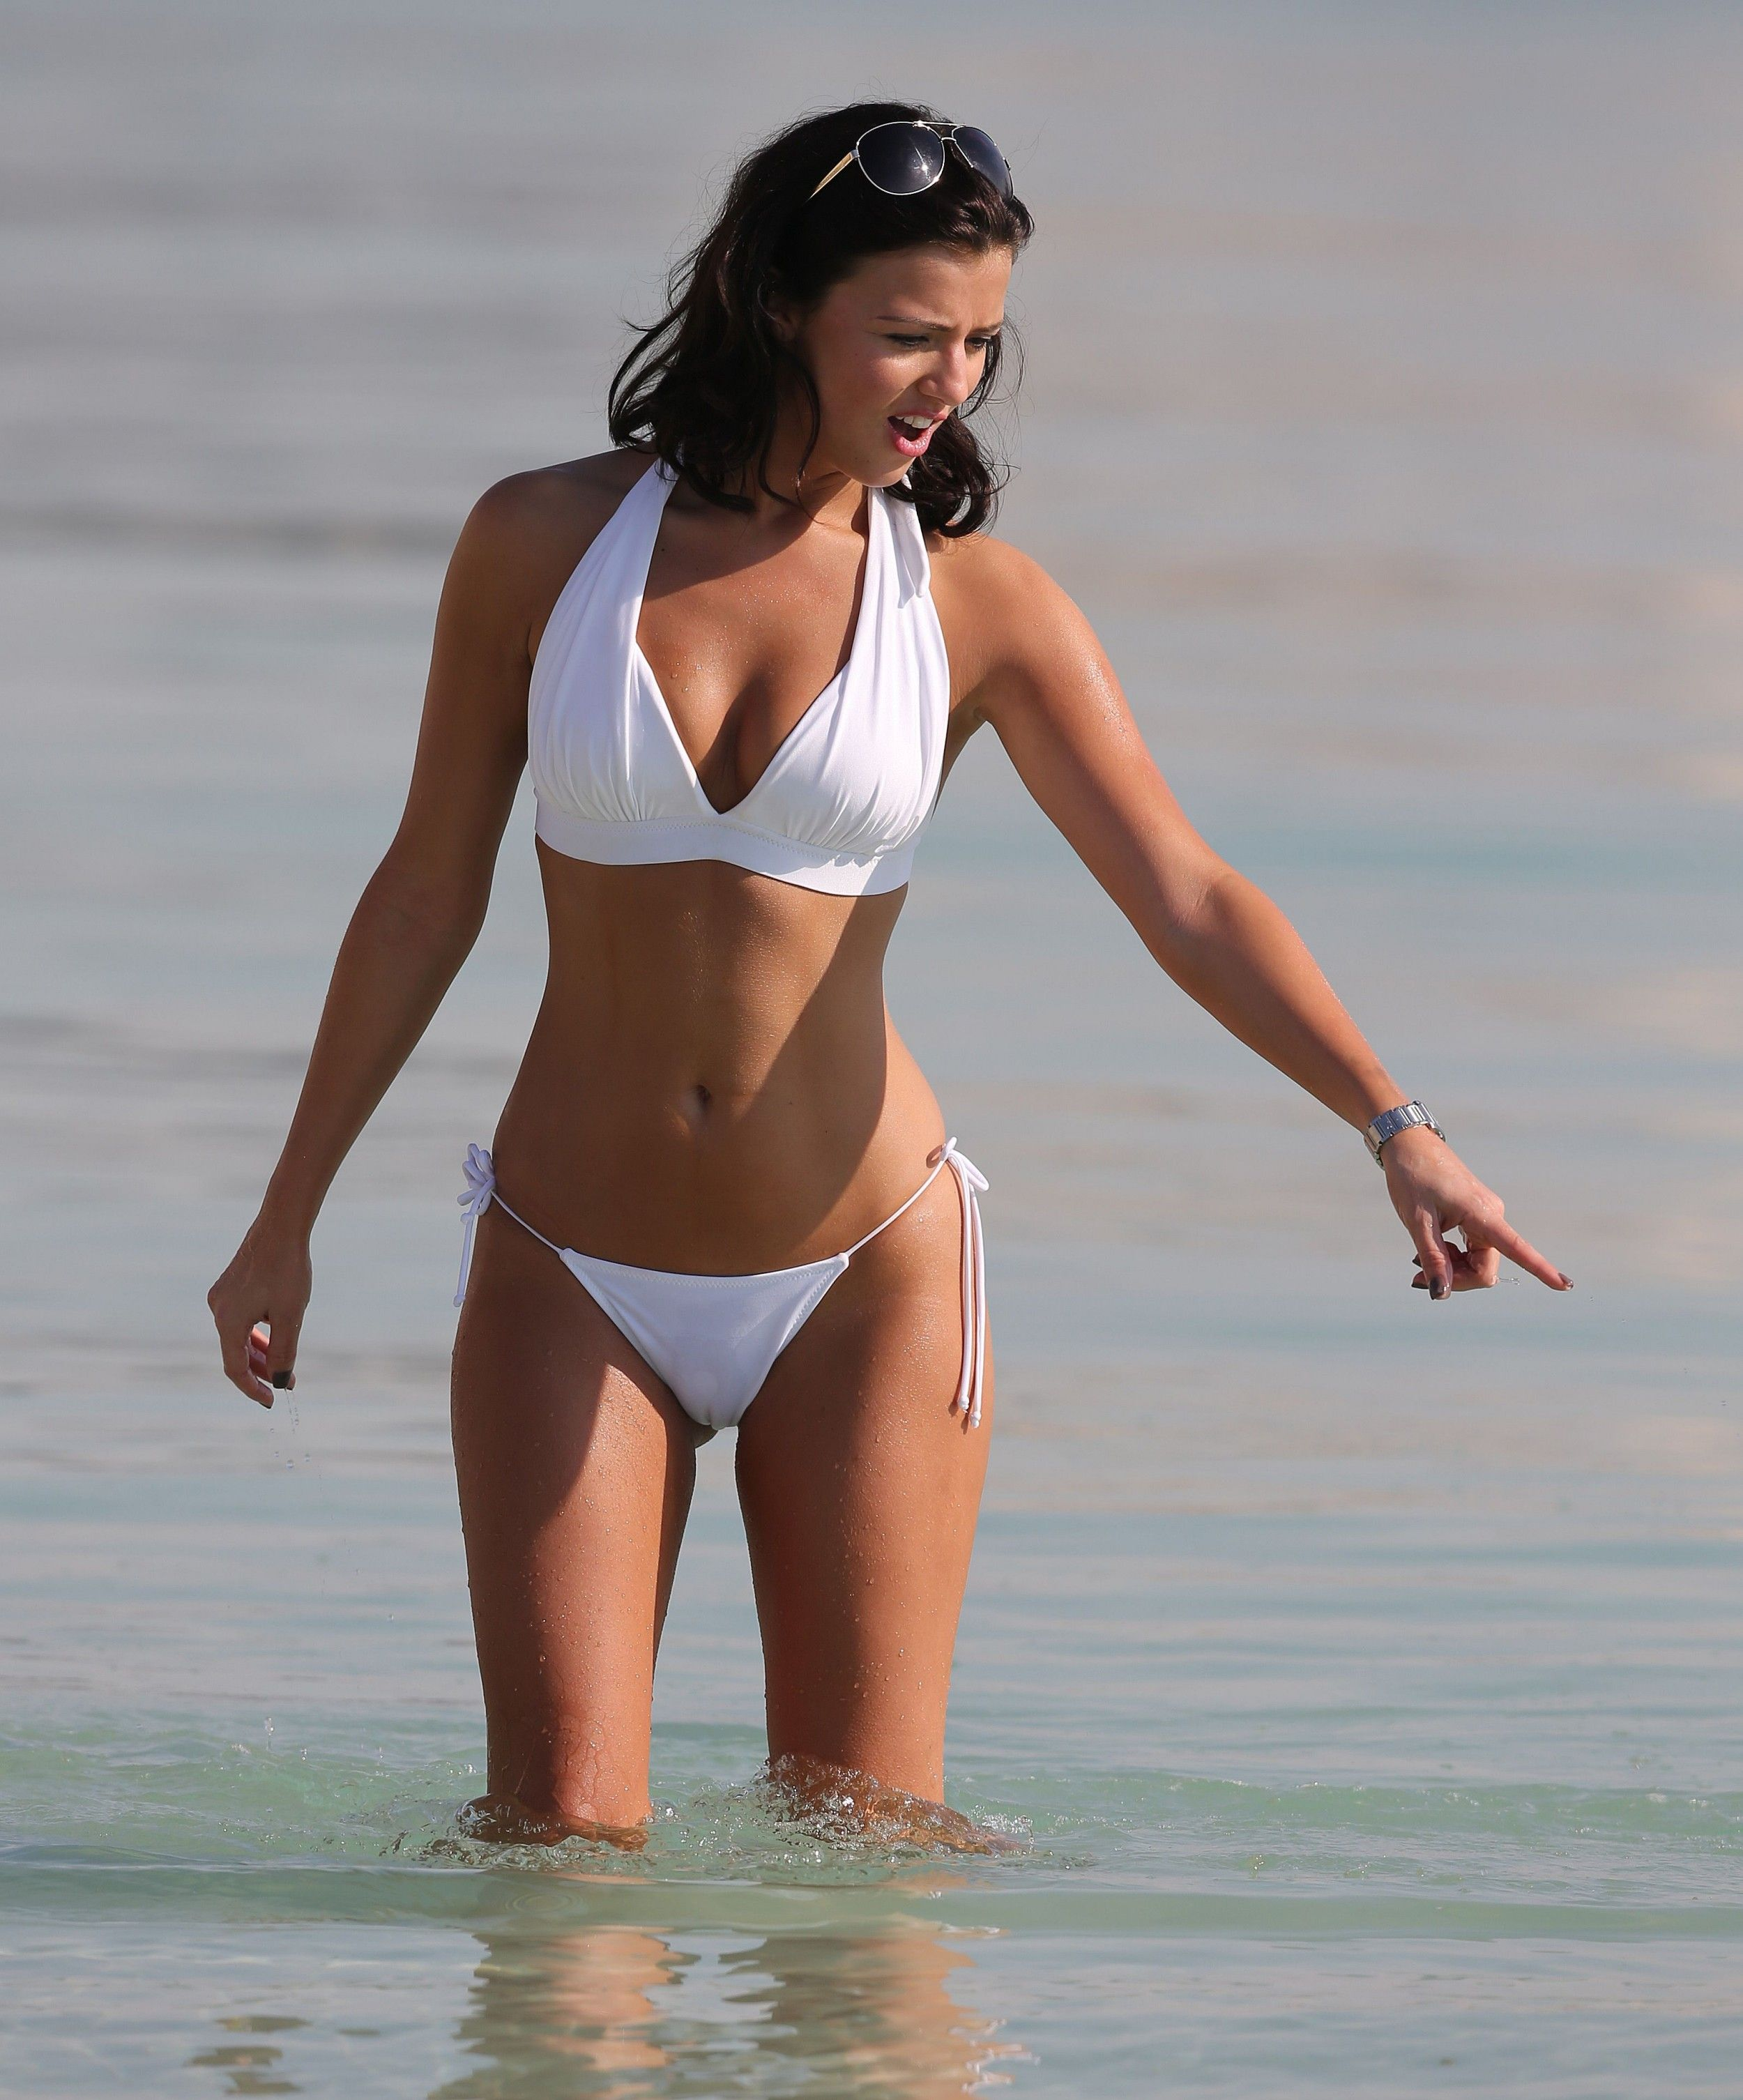 Lucy-Mecklenburgh---wearing-a-white-bikini-in-Dubai--30